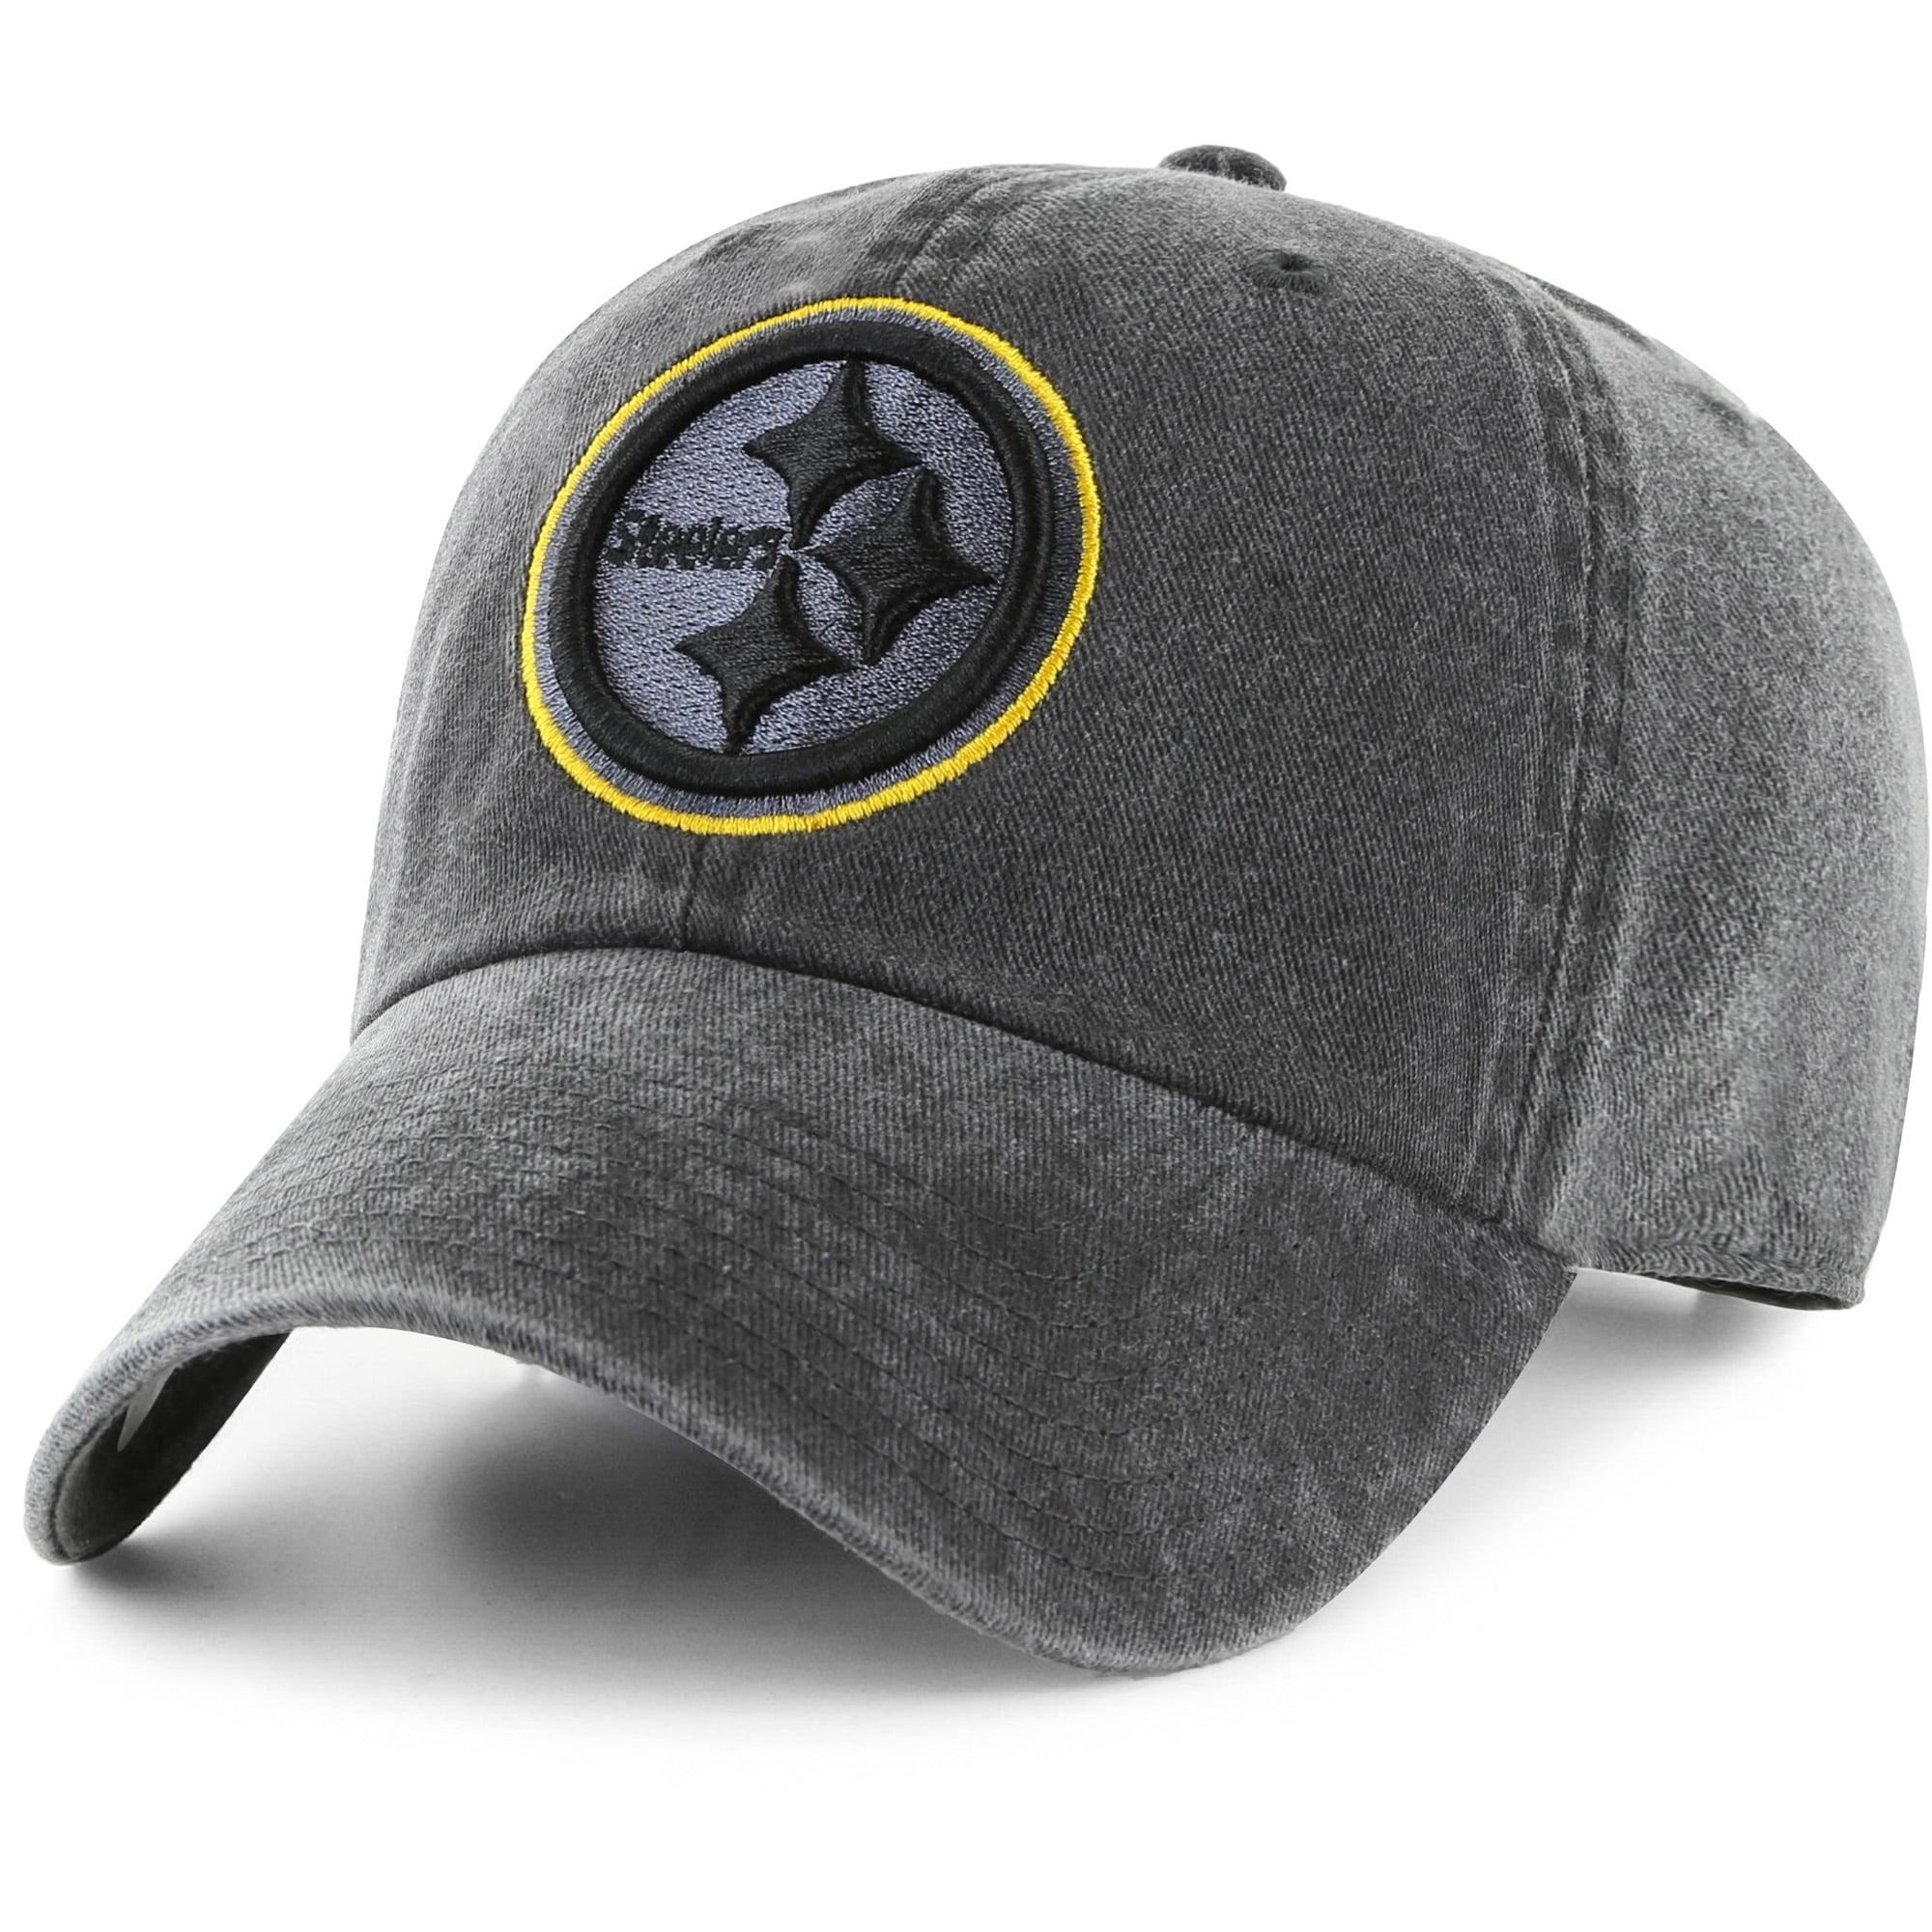 Men's Fan Favorite Black Pittsburgh Steelers Mass Matter Adjustable Hat - OSFA